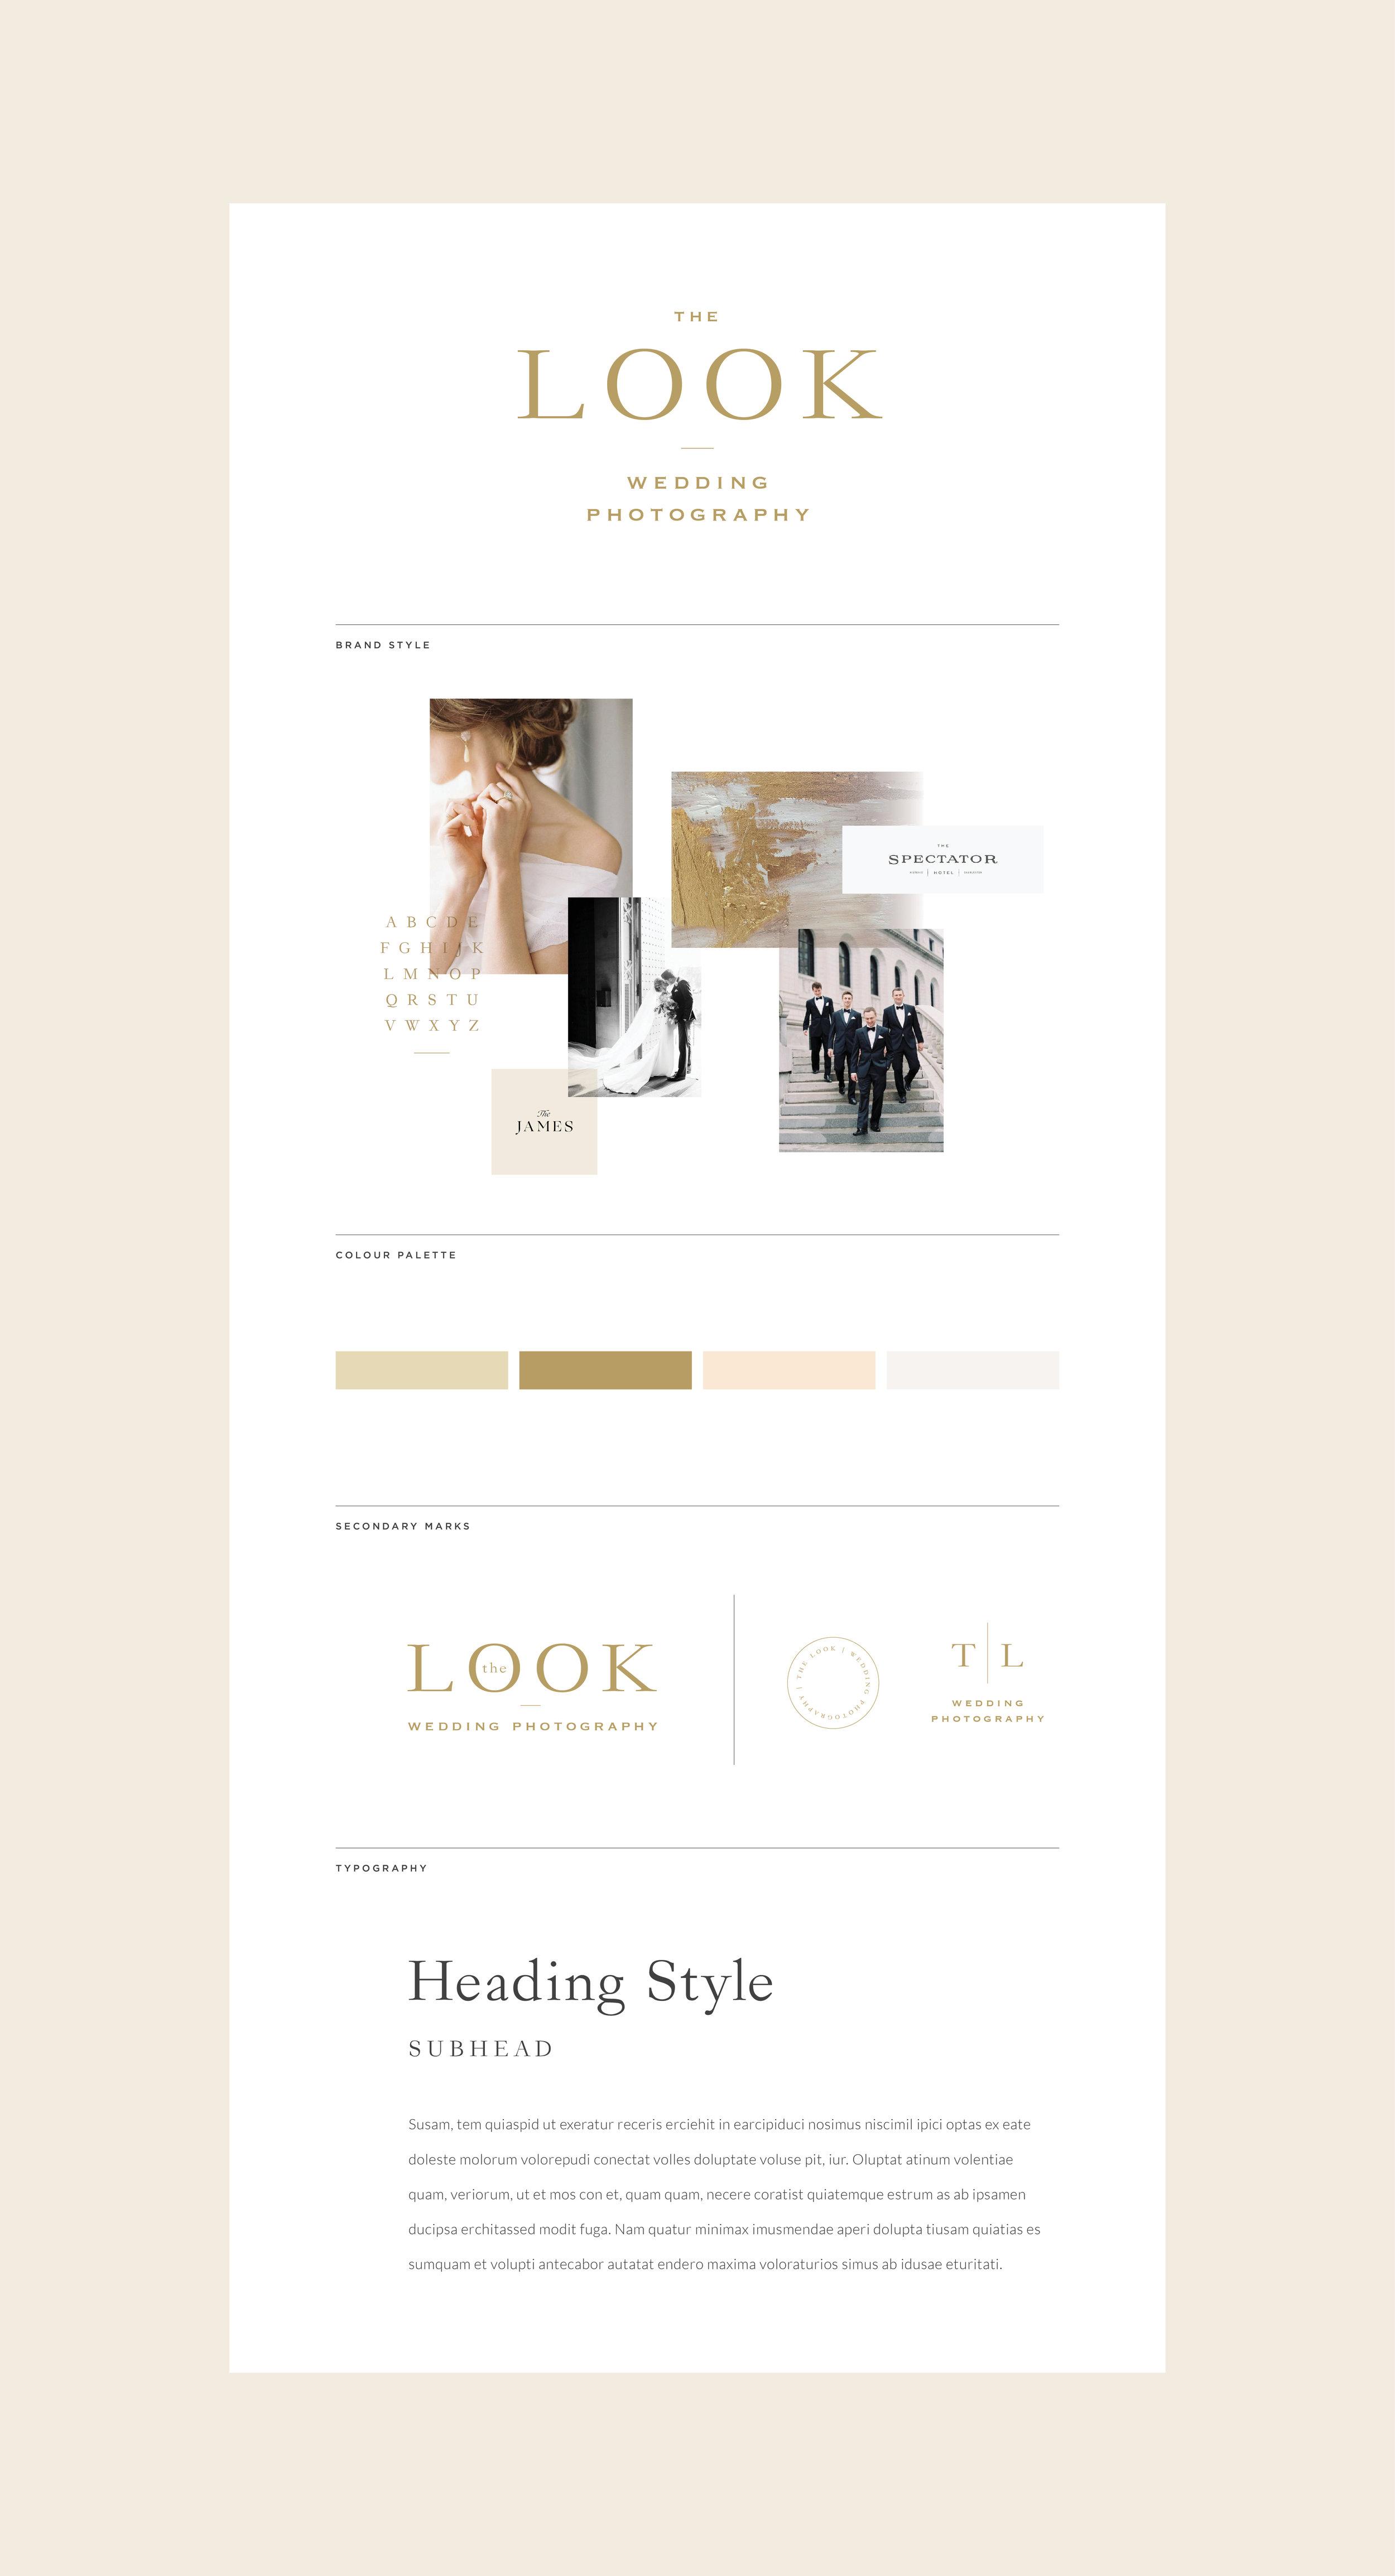 Brand_Identity_TheLook5.jpg